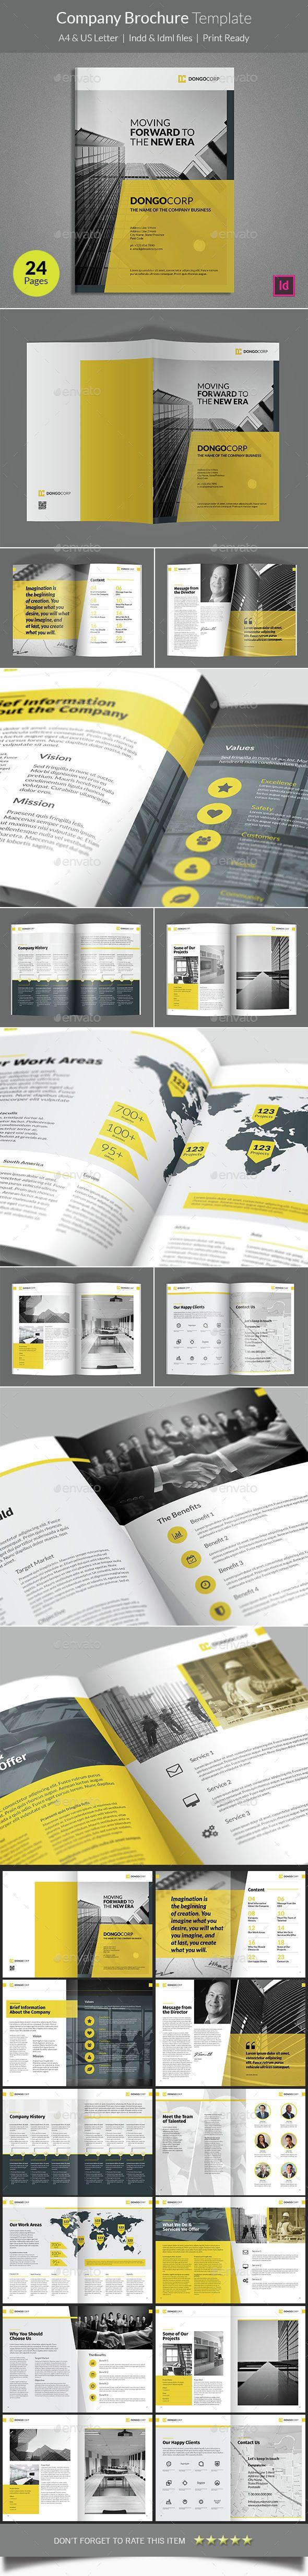 Company Brochure Template - #Corporate #Brochures   Download http://graphicriver.net/item/company-brochure-template/15143040?ref=sinzo